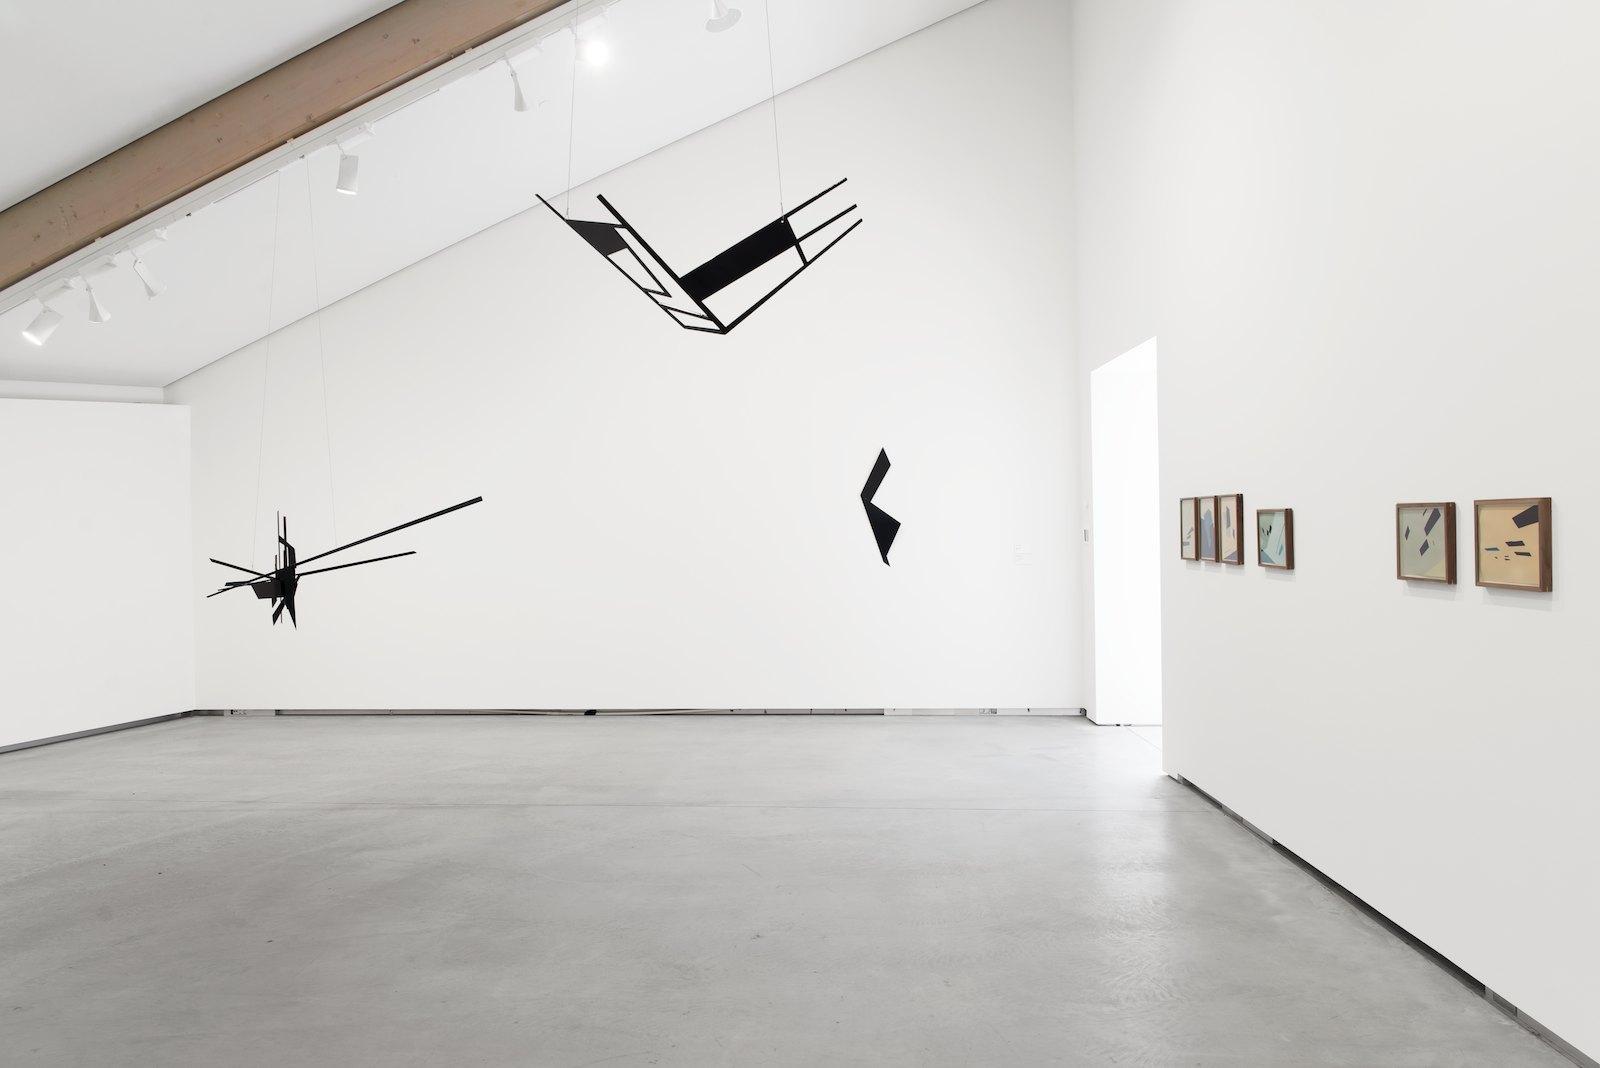 Installation view, NN-A, NN-A, NN-A, Ny Norsk Abstraksjon, Astrup Fearnley Museet, Oslo 2015